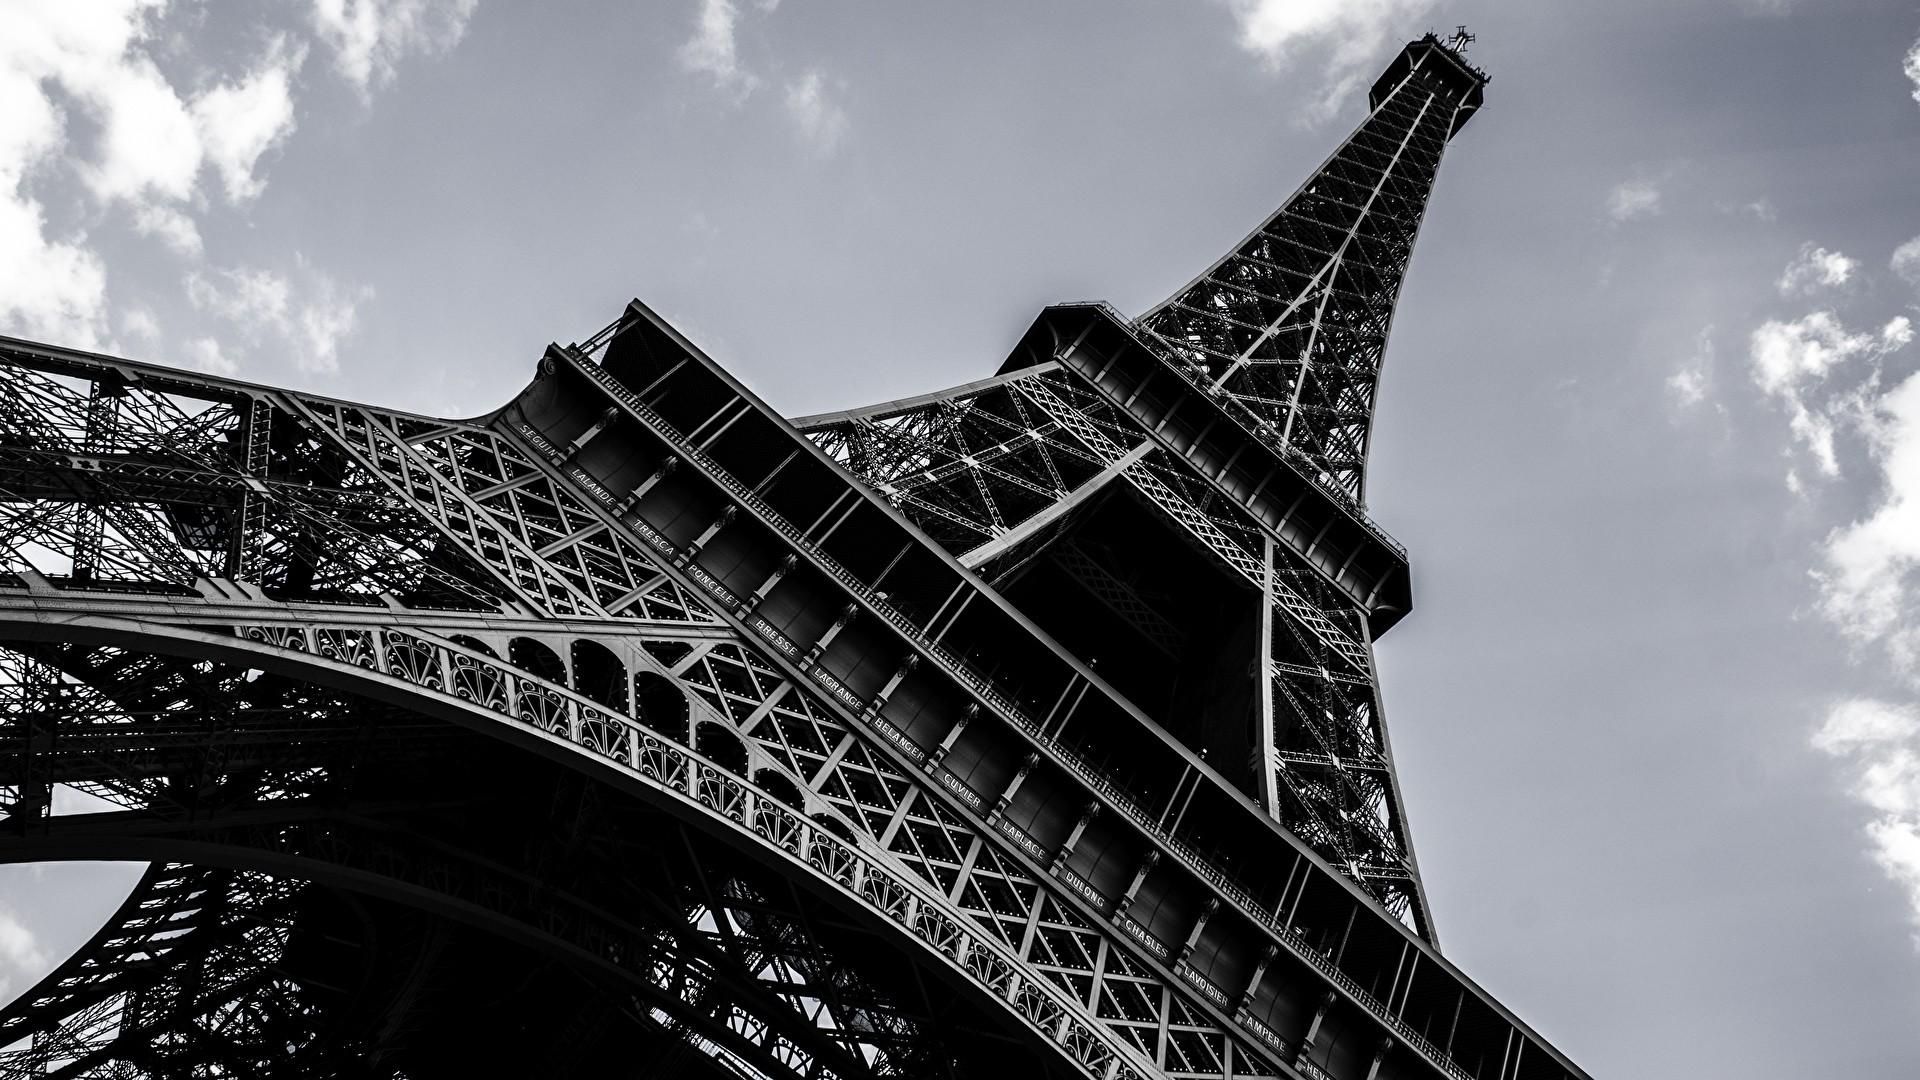 Eiffel Tower PC Wallpaper HD